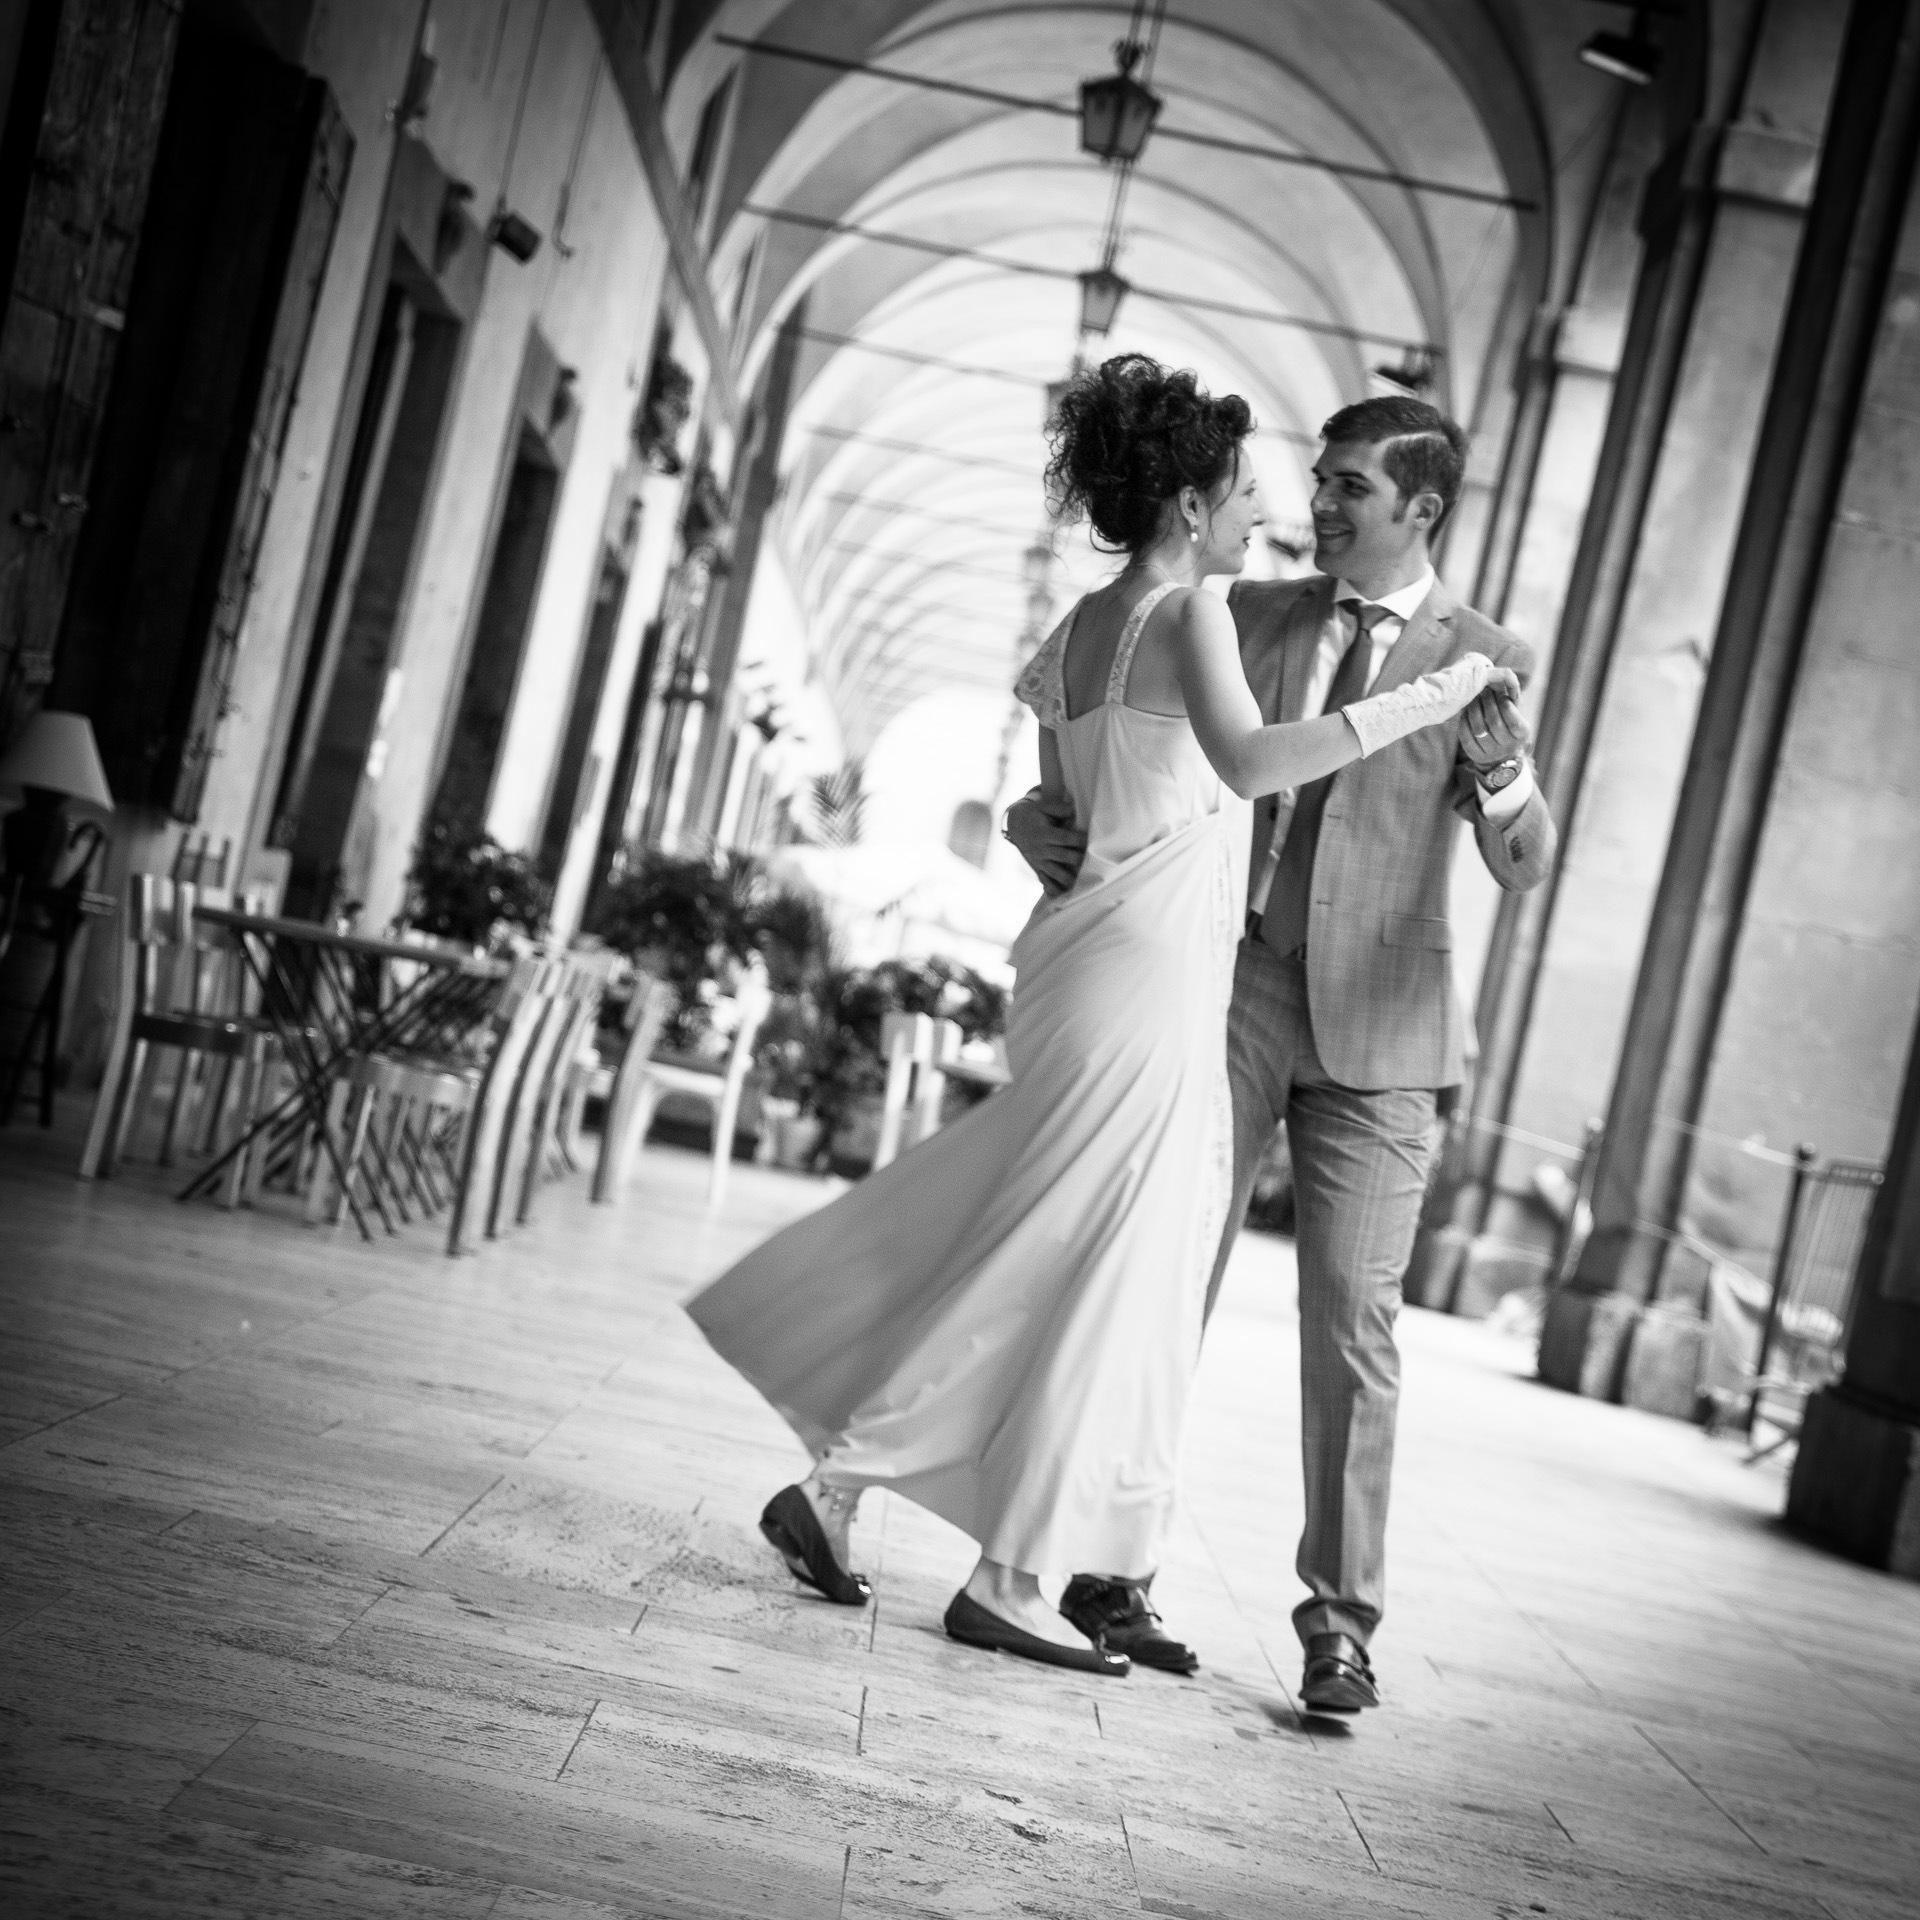 140614182201 - Foto Francesco Ghignoni